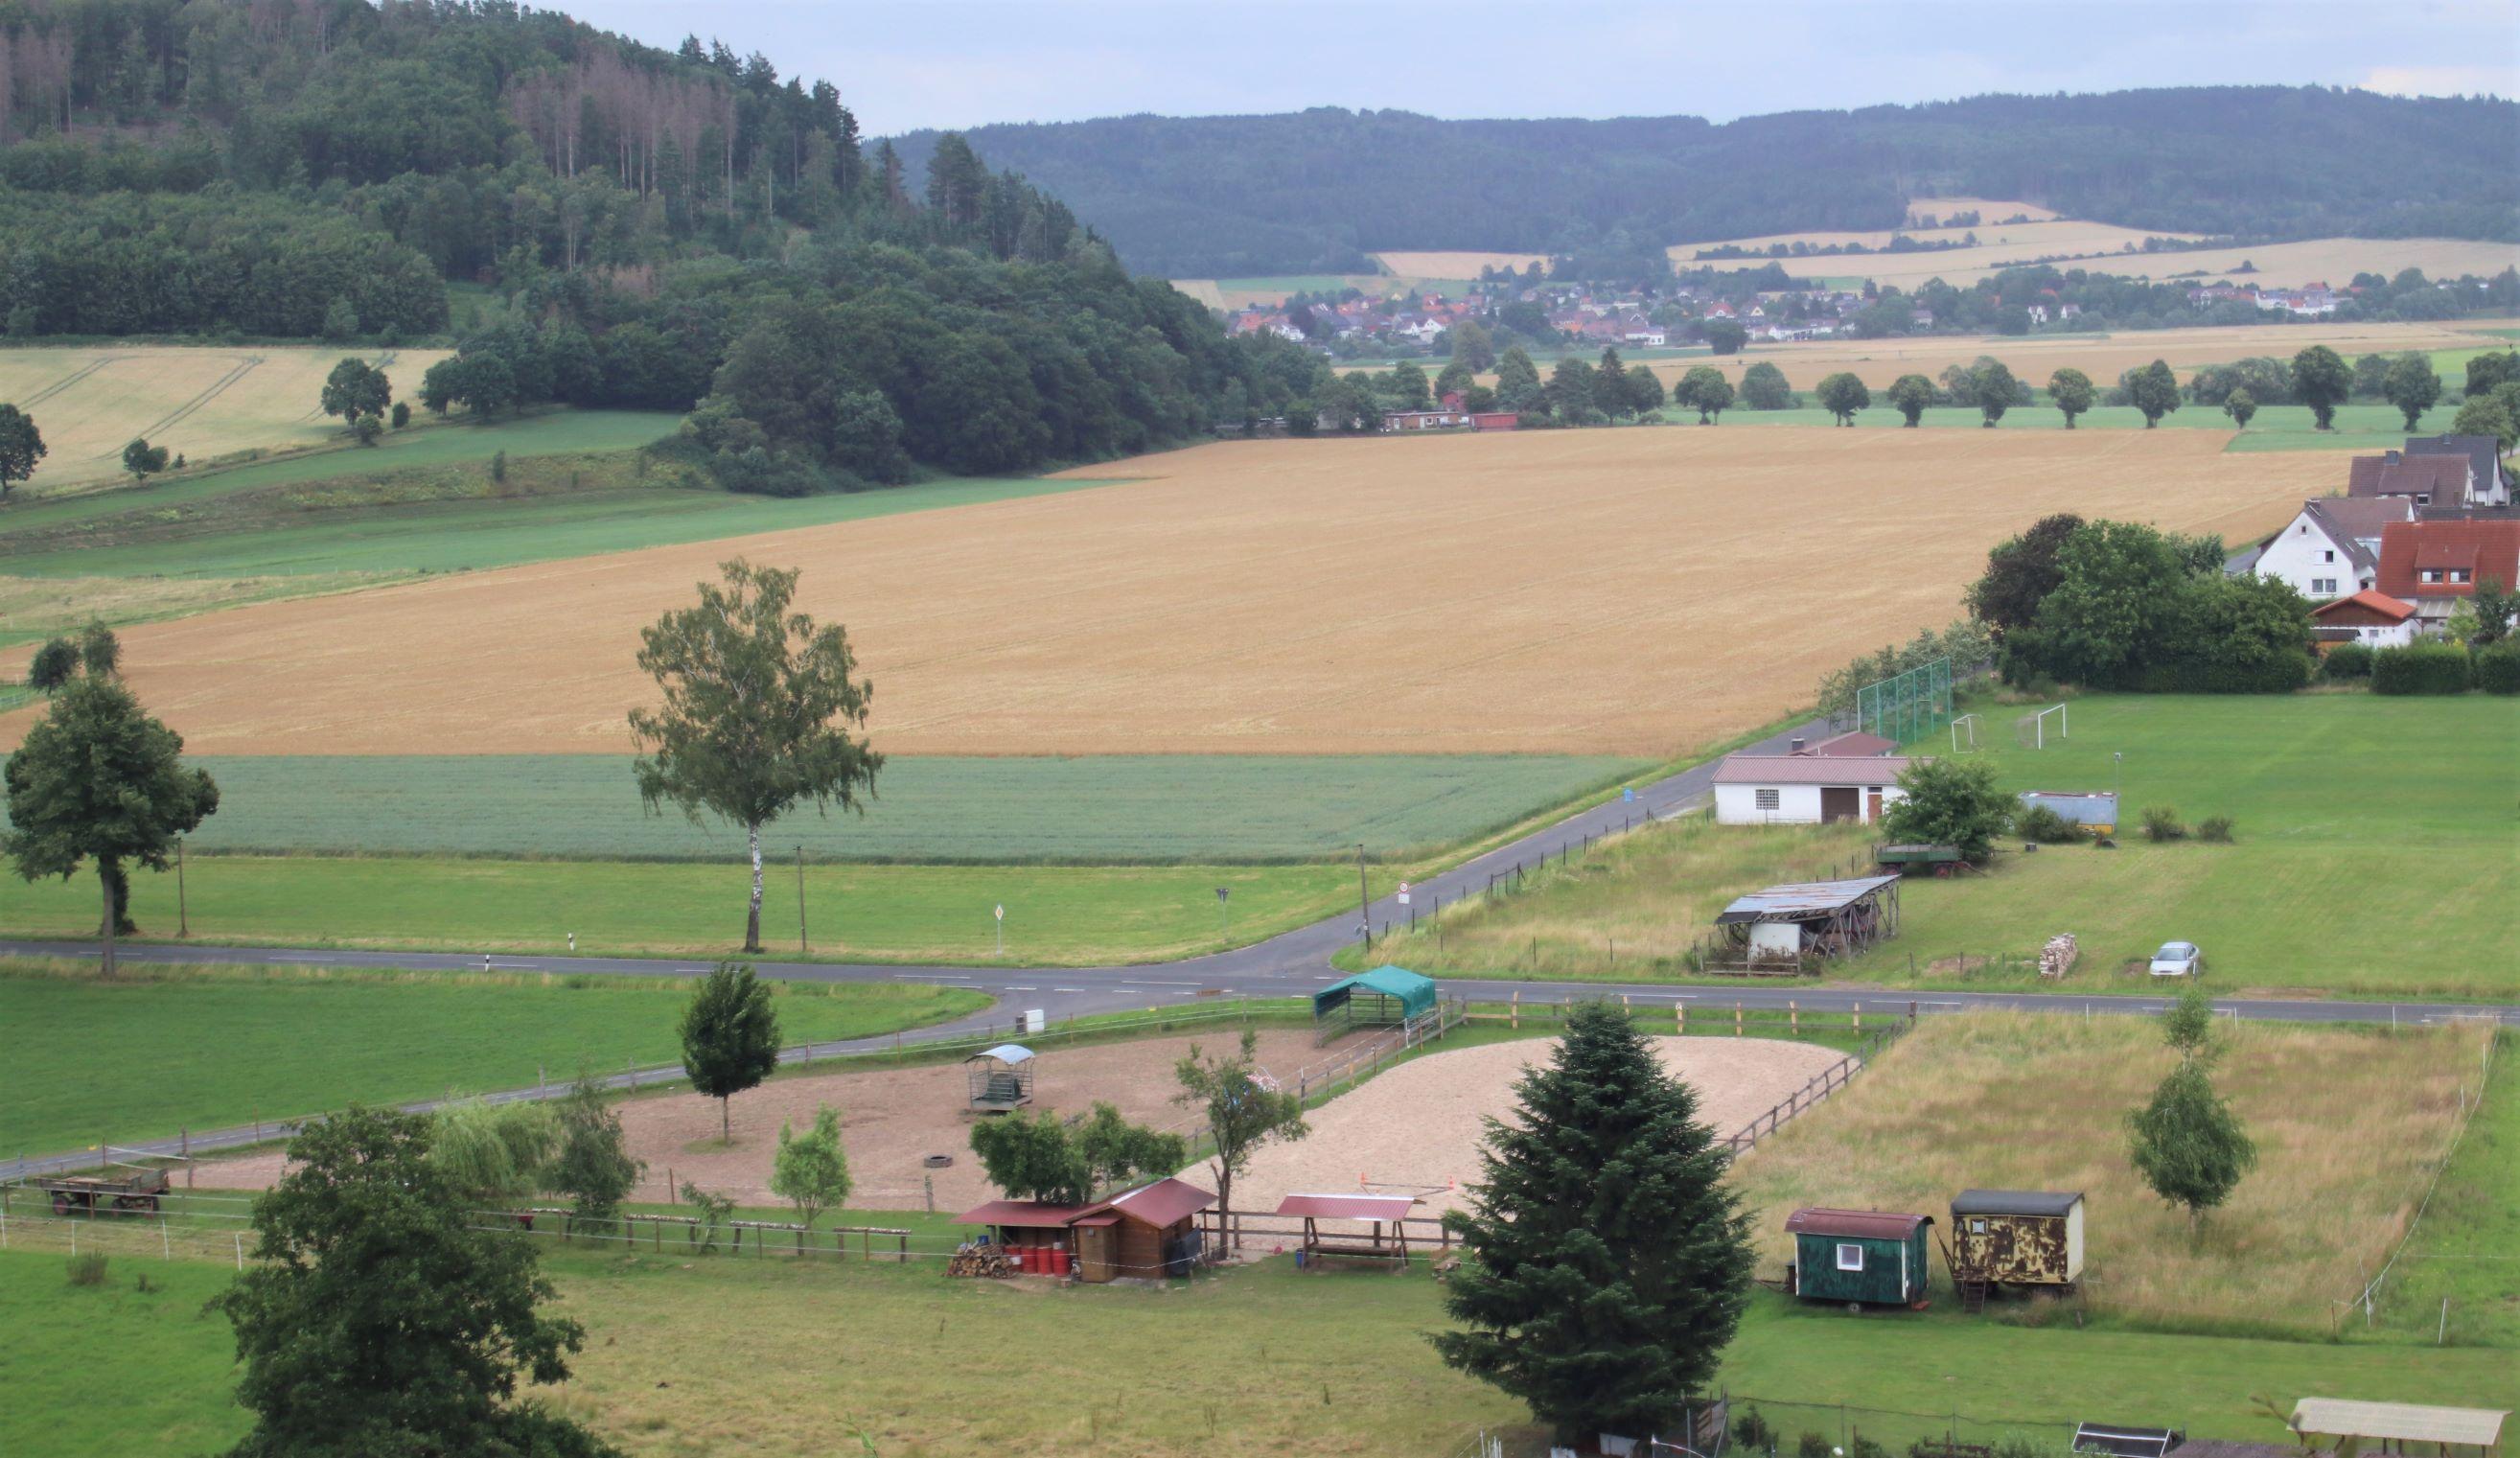 Reitplatz der Absarokee Horse Farm